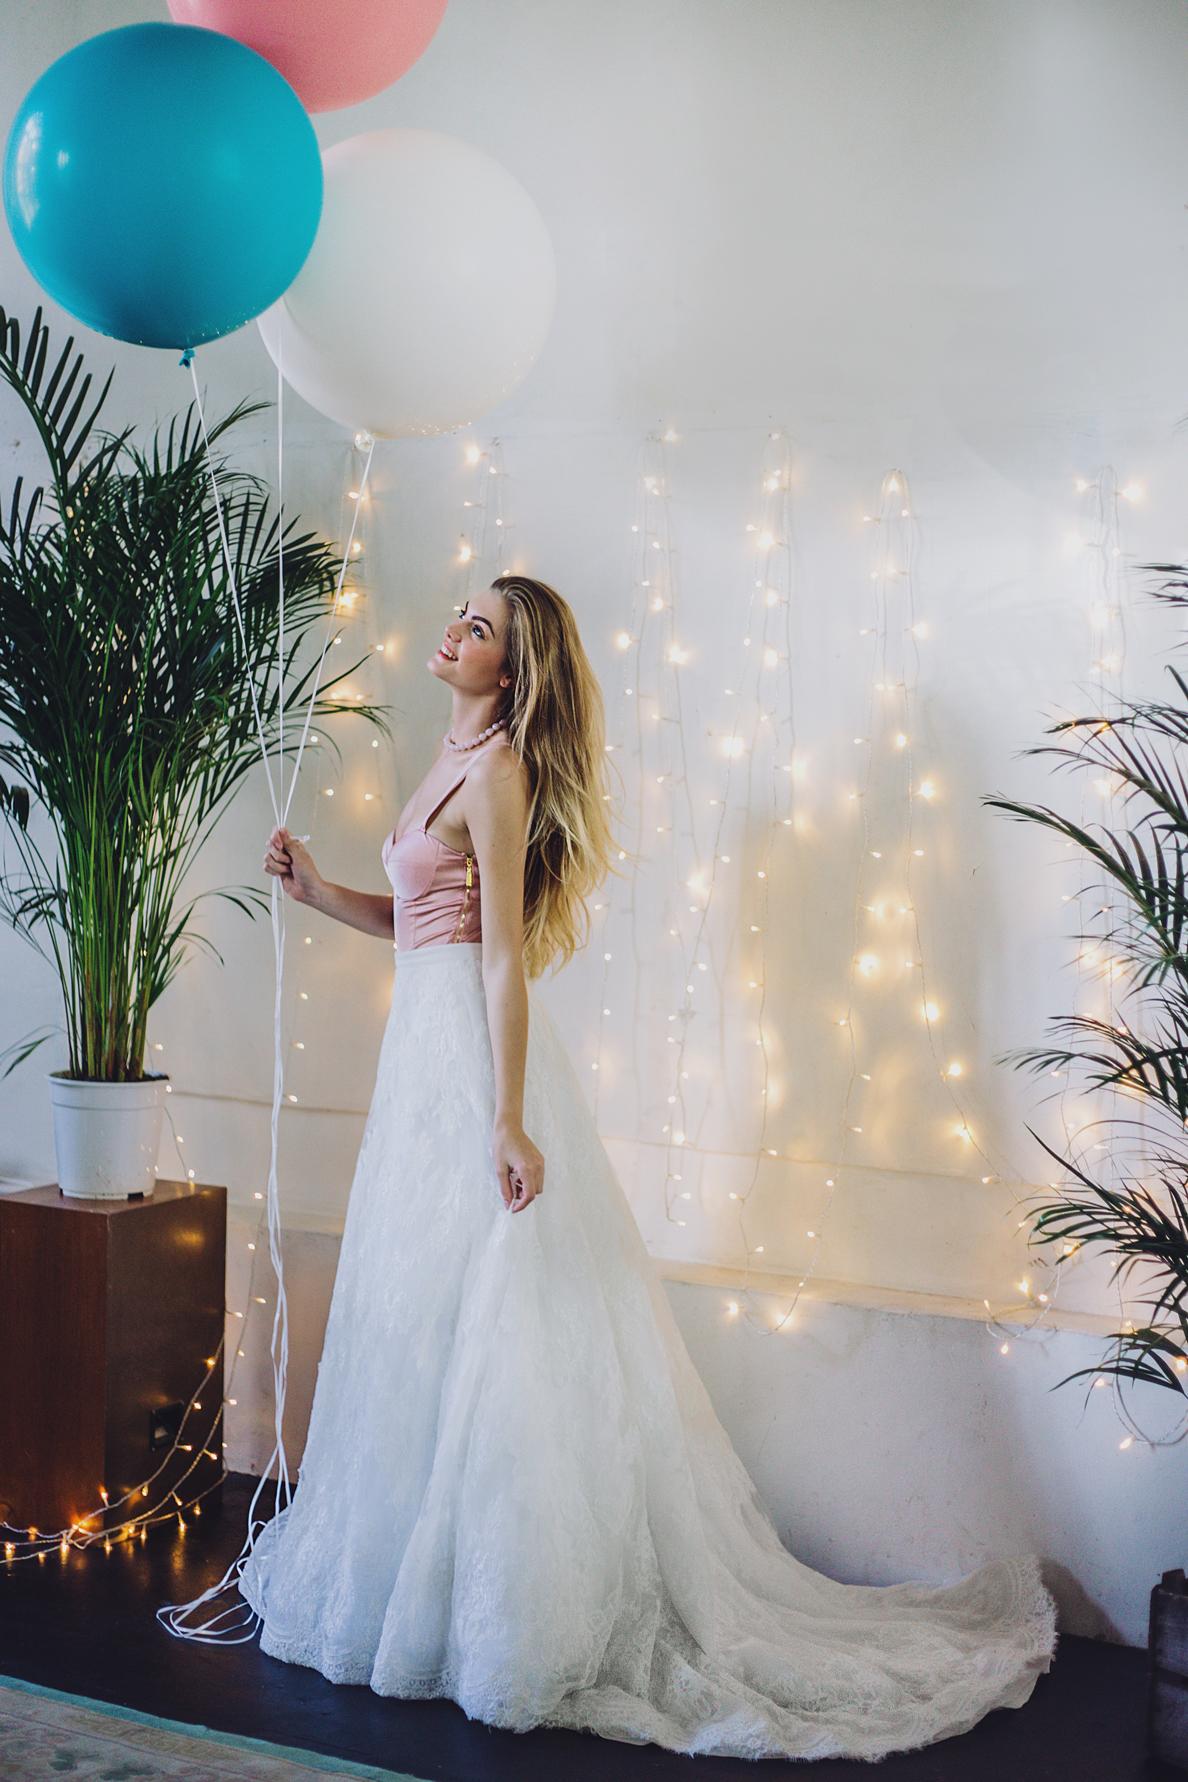 norfolk_wedding_photographer _norwich_anglia_documentary_reportage_storybook (20).jpg